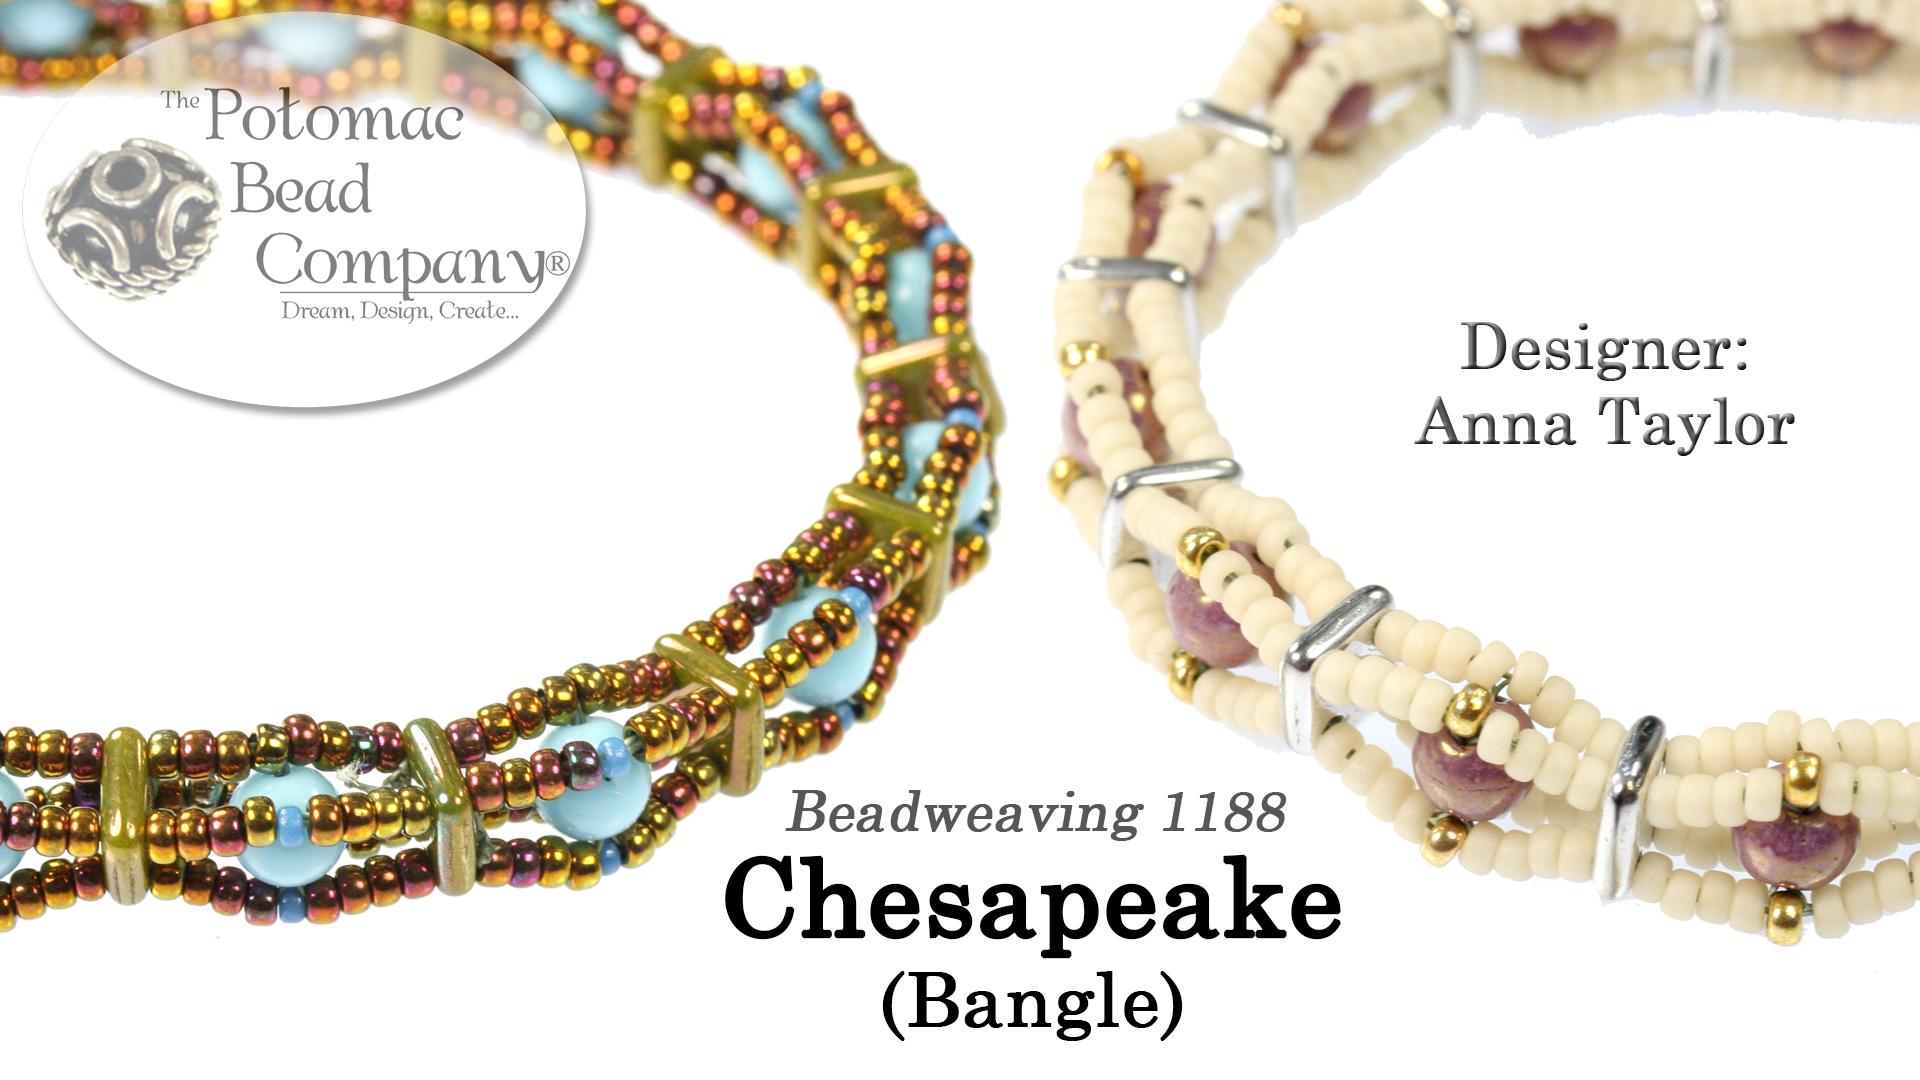 How to Bead Jewelry / Videos Sorted by Beads / RounDuo® & RounDuo® Mini Bead Videos / Chesapeake Bangle Tutorial